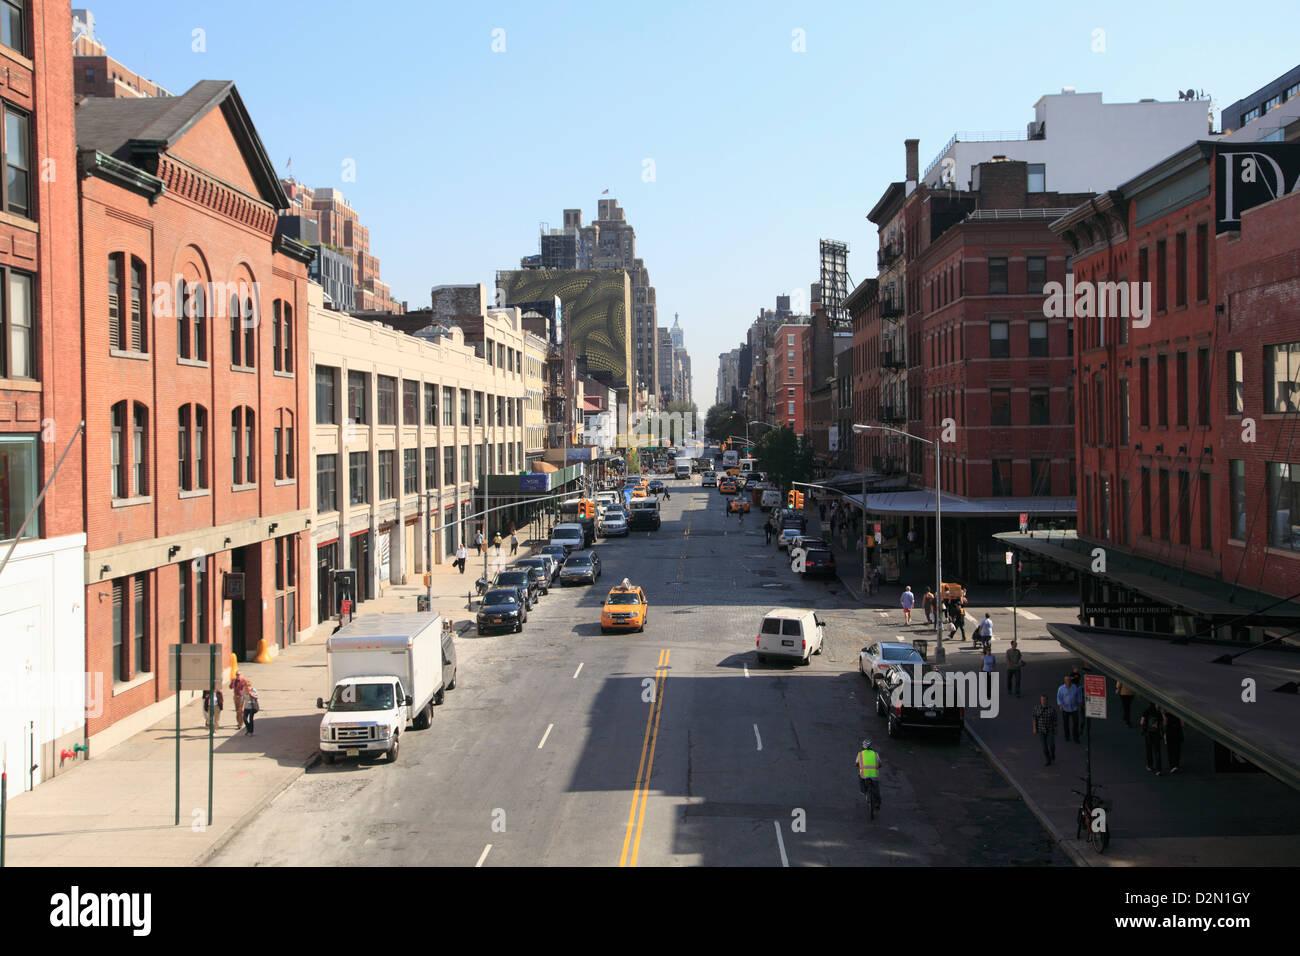 14th Street, Meatpacking District, trendy downtown neighborhood, Manhattan, New York City, USA - Stock Image